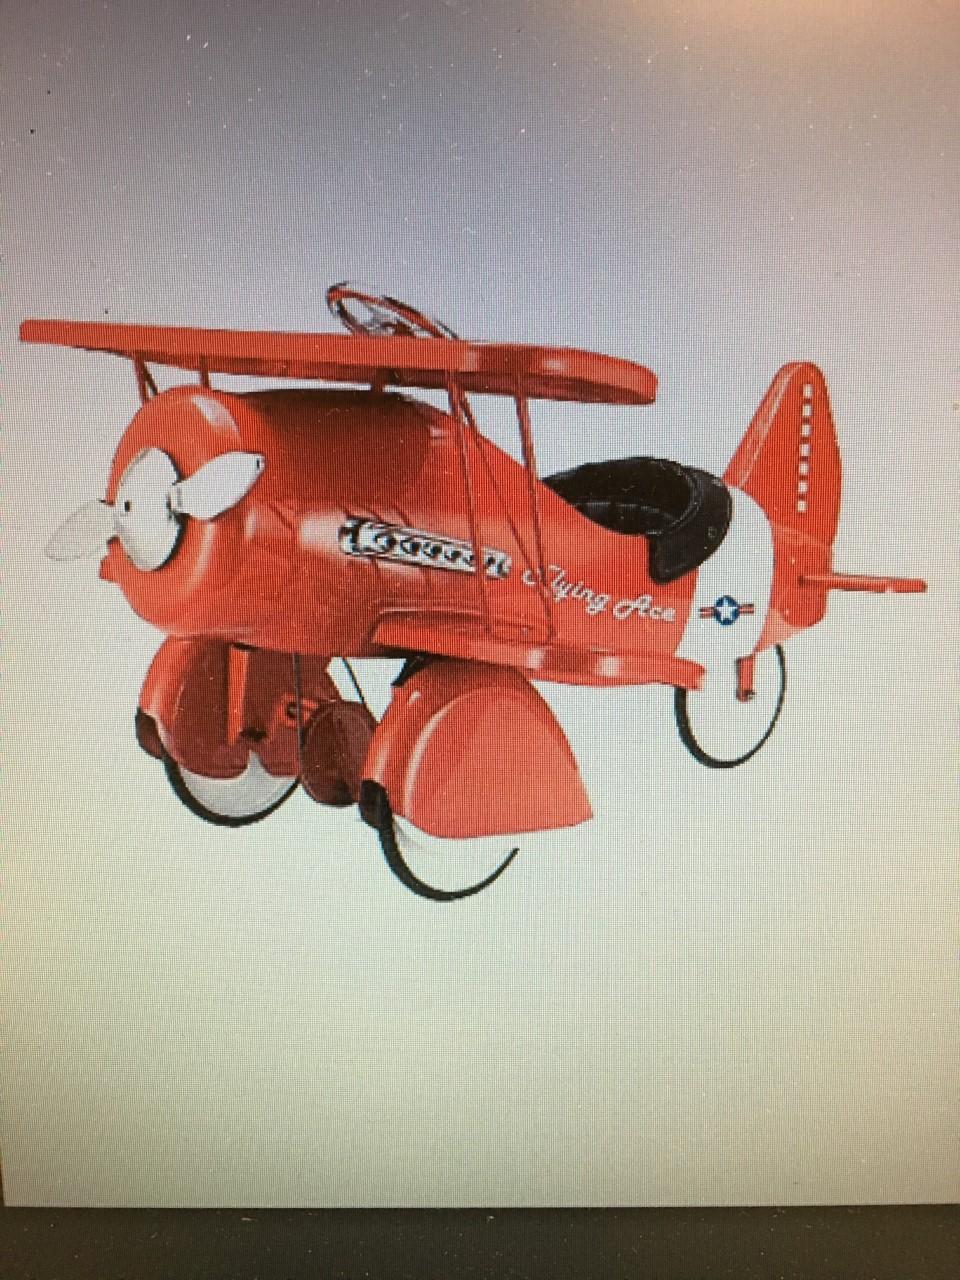 Pibbs - Airplane Kid's Hydraulic Chair